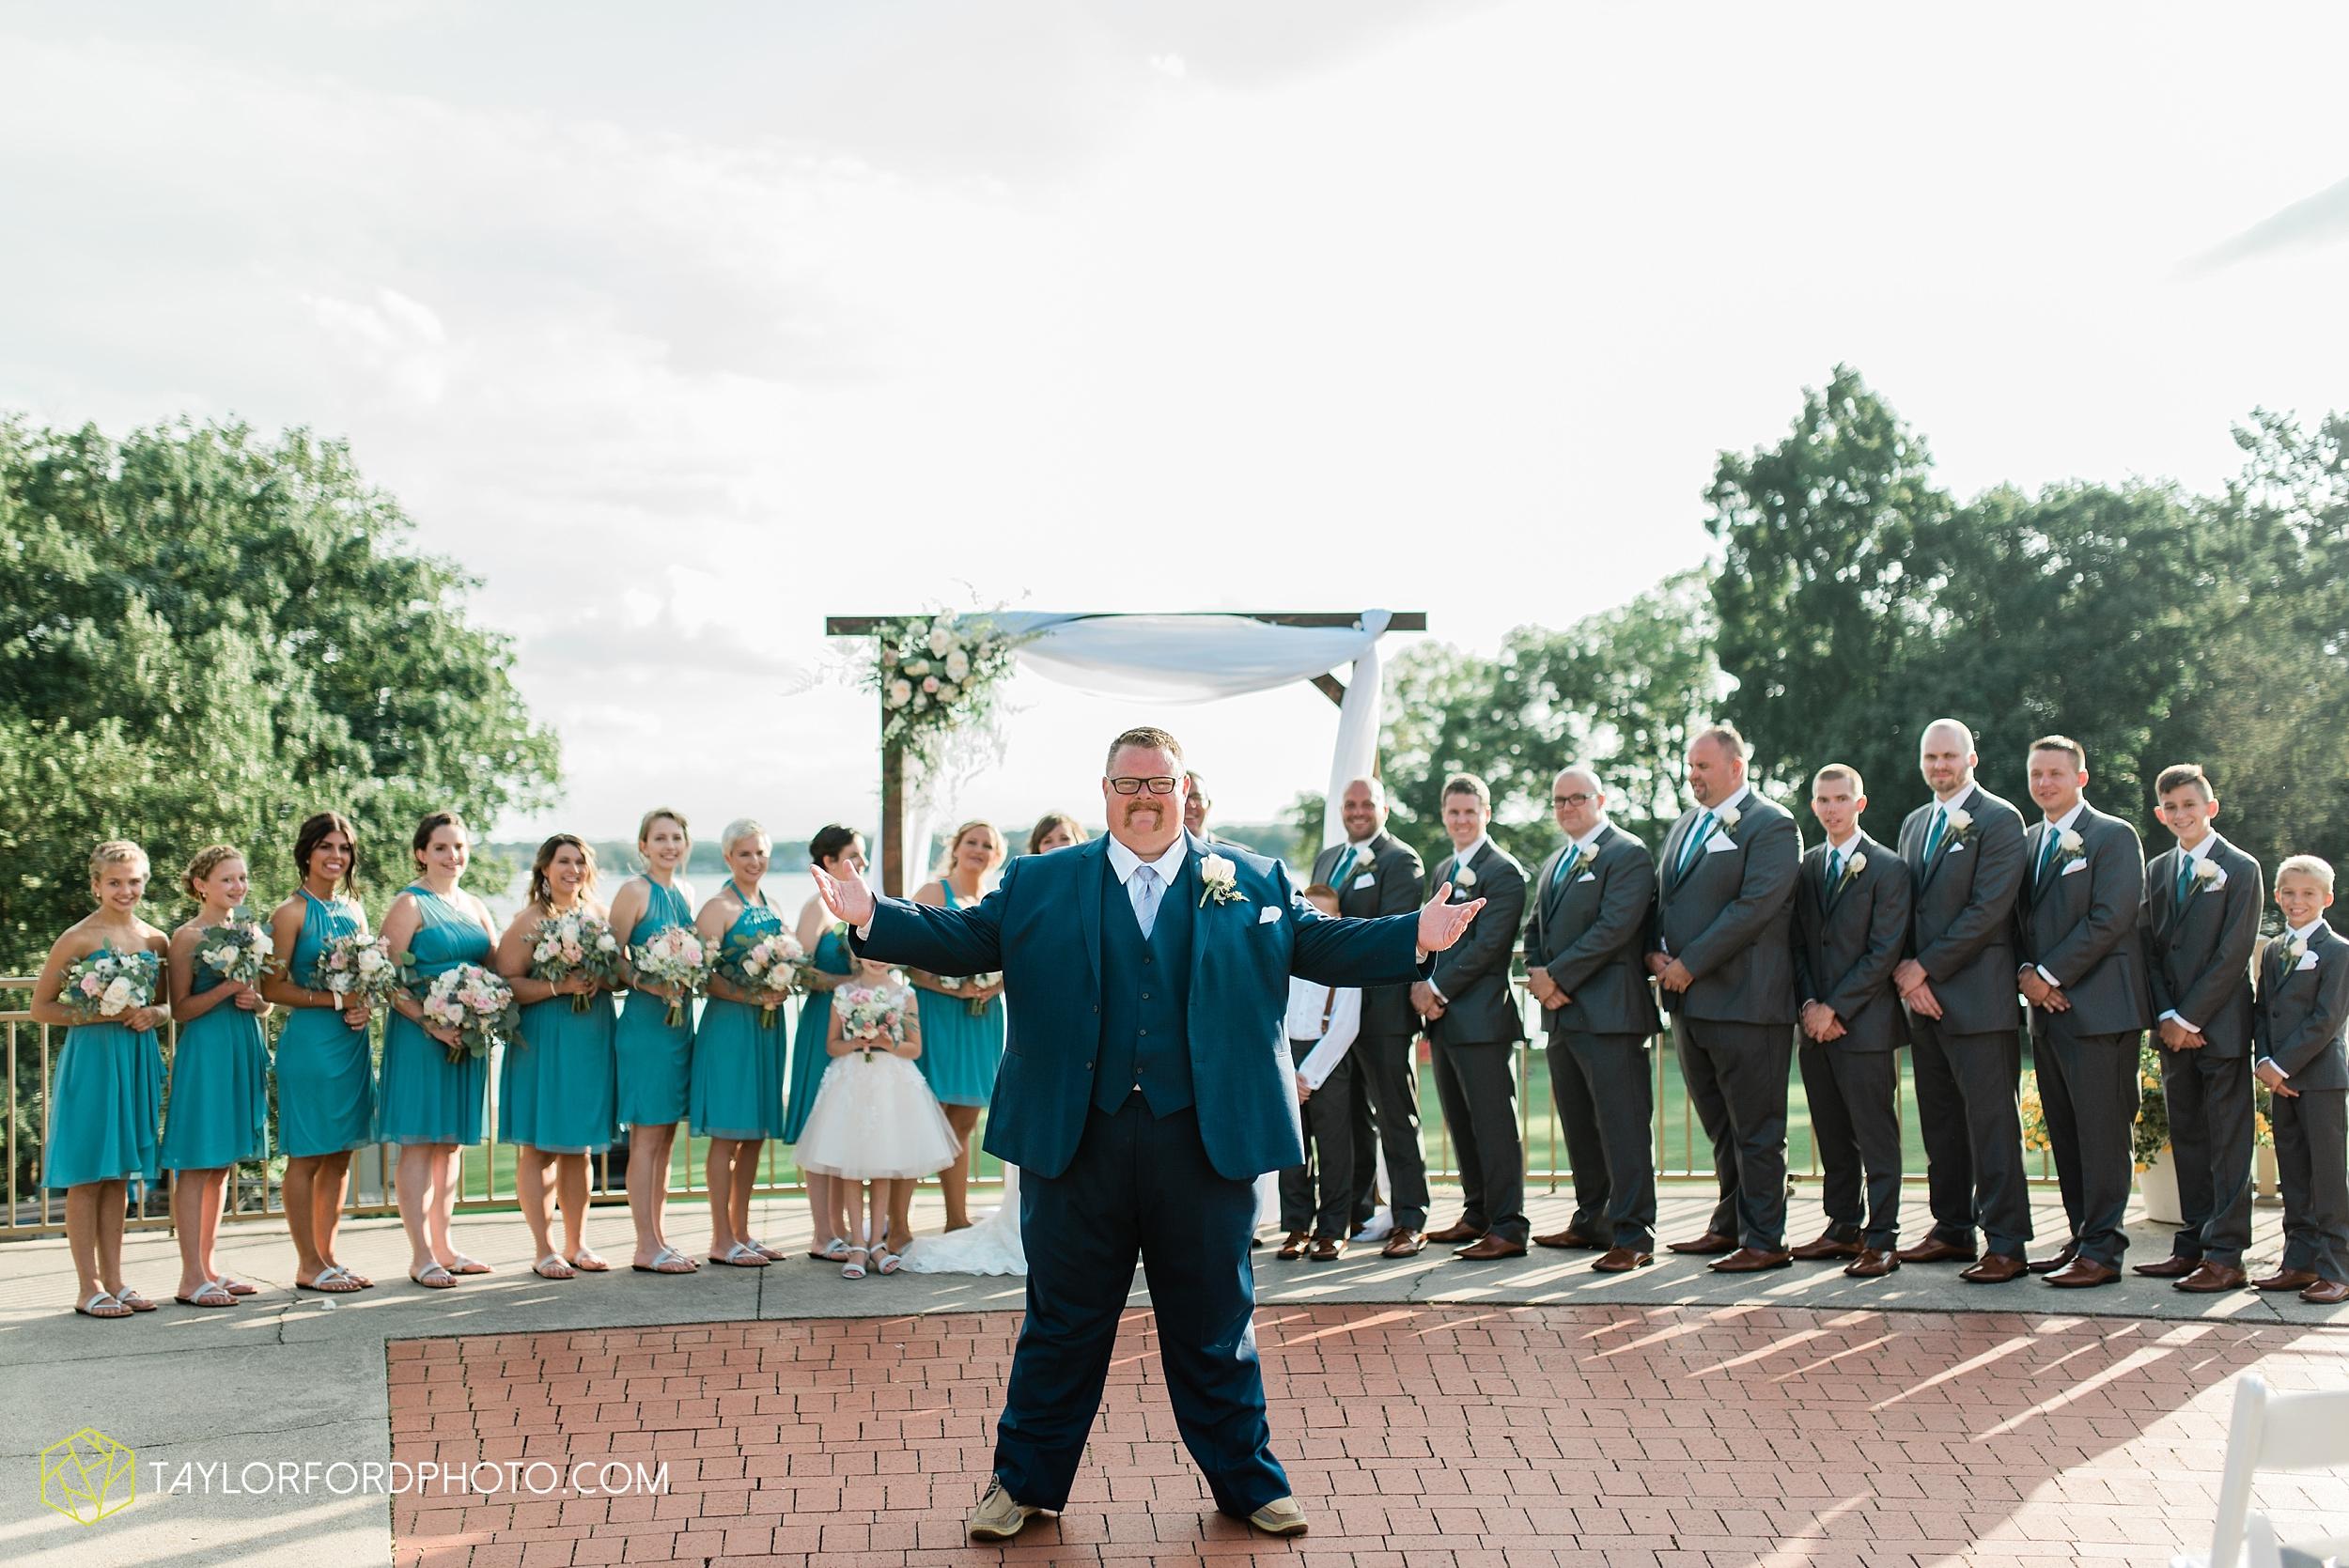 brook-loren-pokagon-state-park-angola-indiana-potowatomi-inn-wedding-fall-lake-james-photographer-taylor-ford-photography_0528.jpg